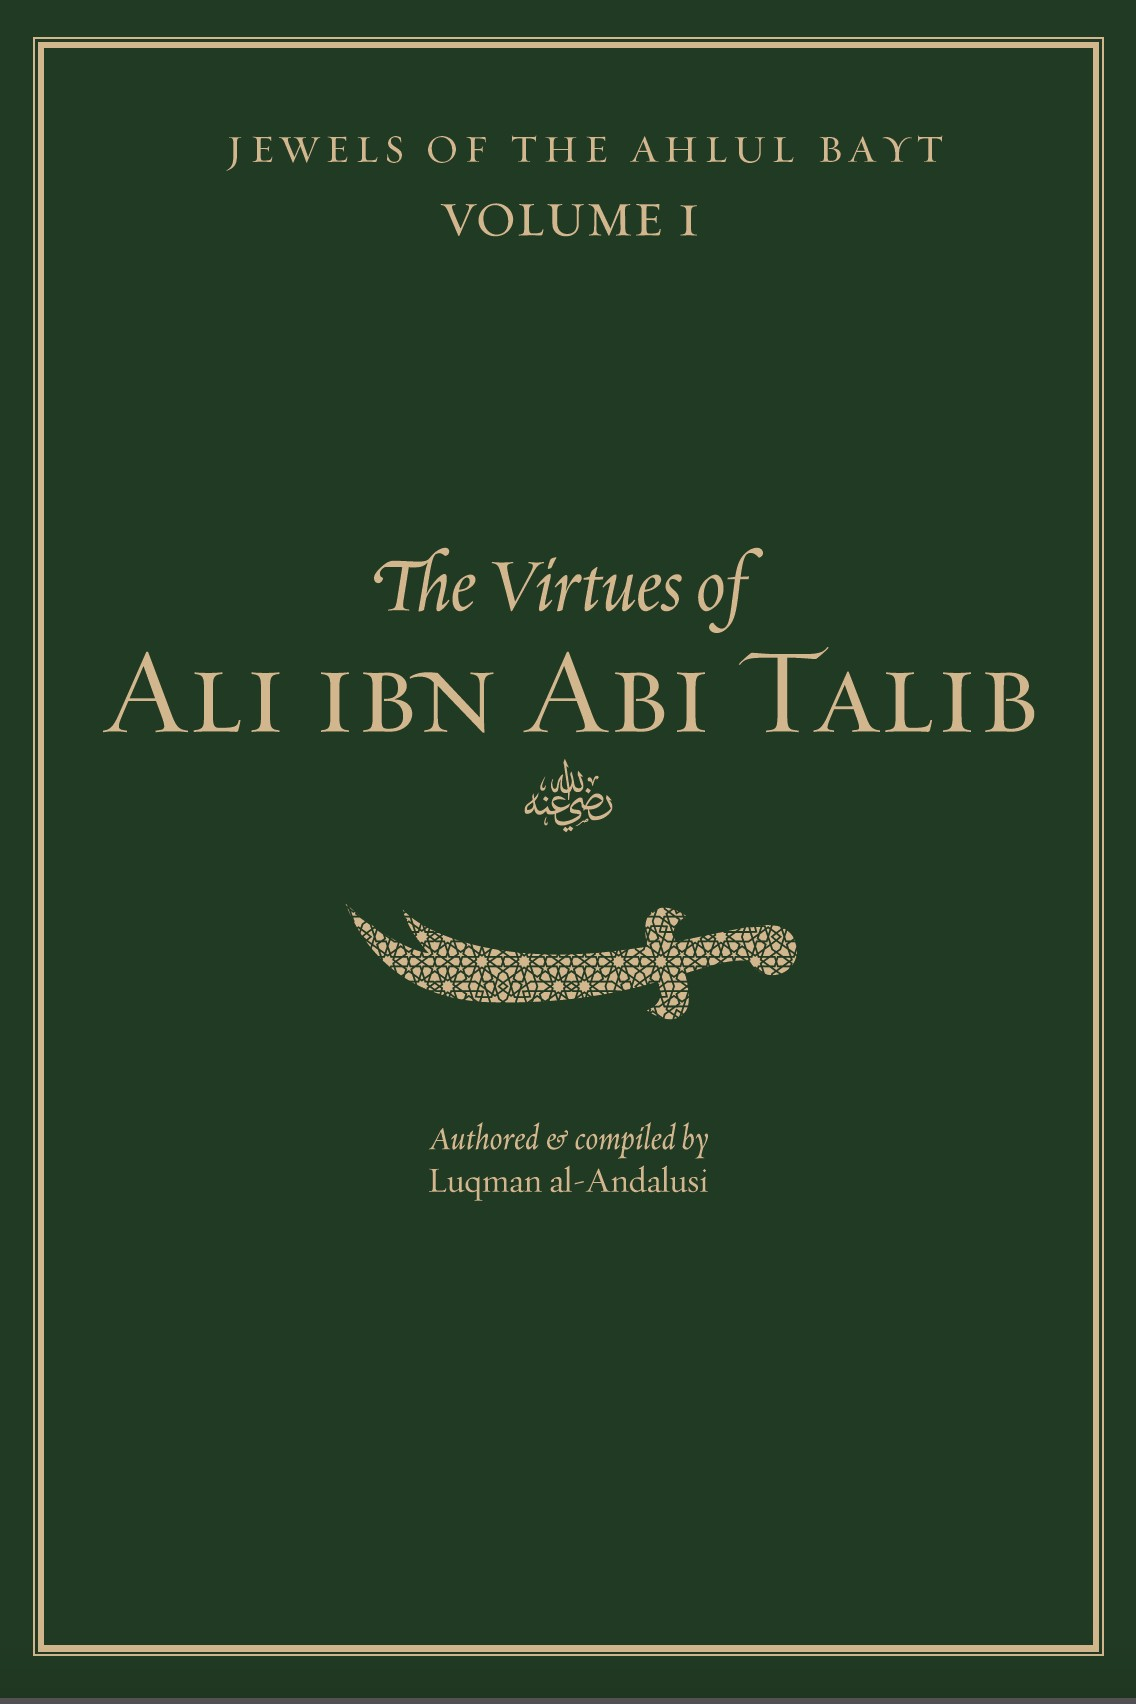 Maula Ali Shrine Wallpaper: Jewels Of The Ahlul Bayt Vol 1 : The Virtues Of Ali Ibn